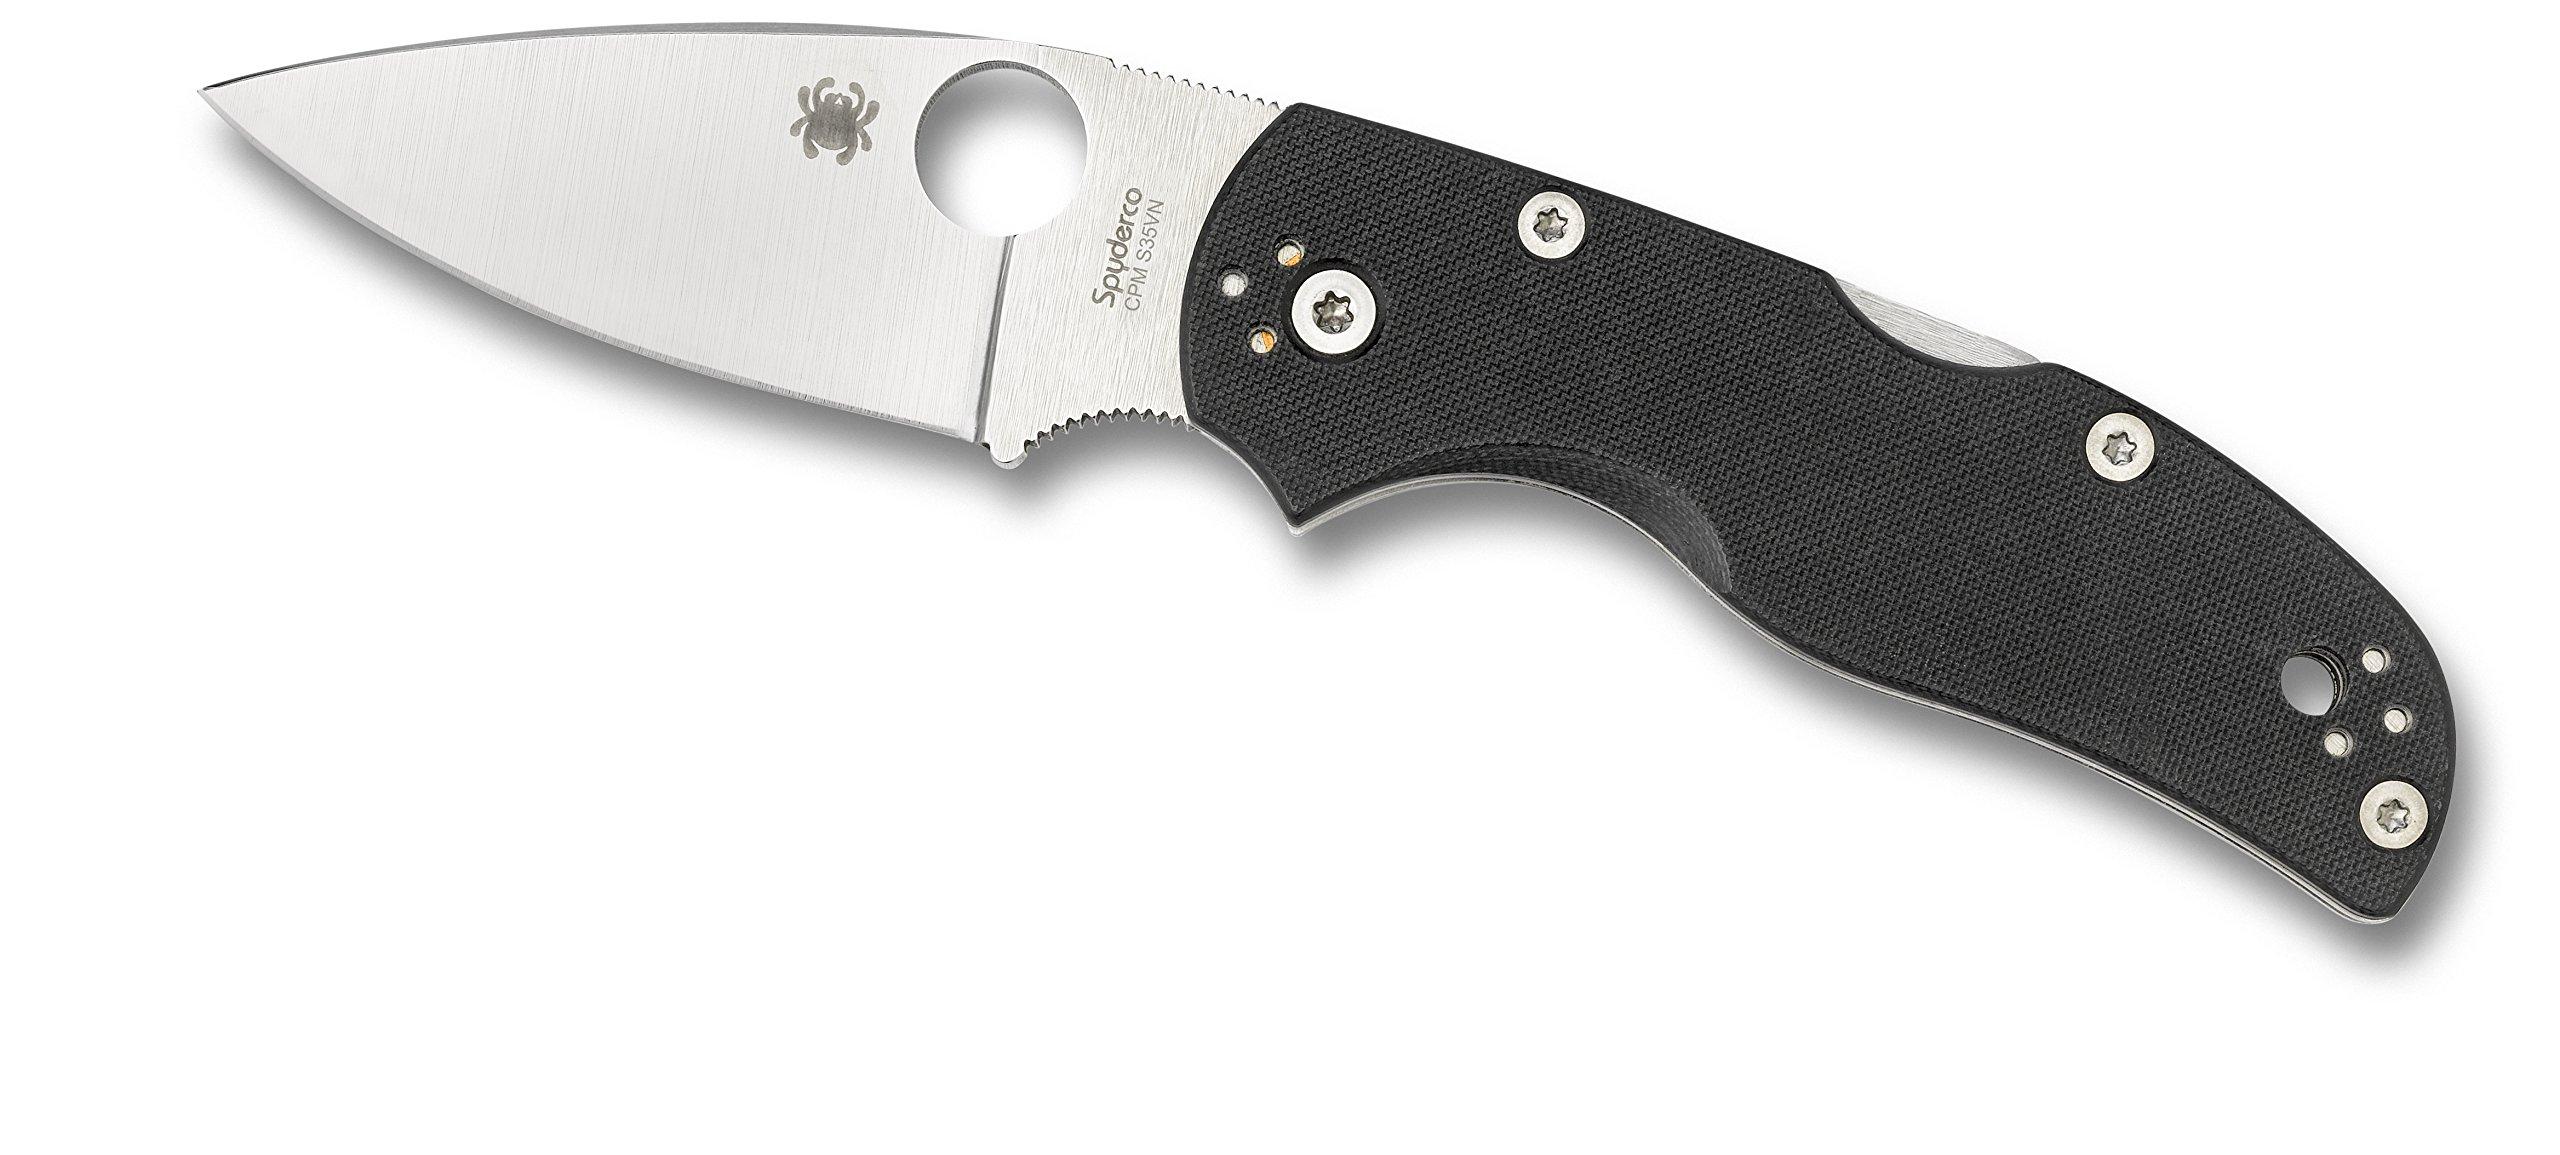 Spyderco C41GP5 Native5 G-10 Plain Edge Knife by Spyderco (Image #3)